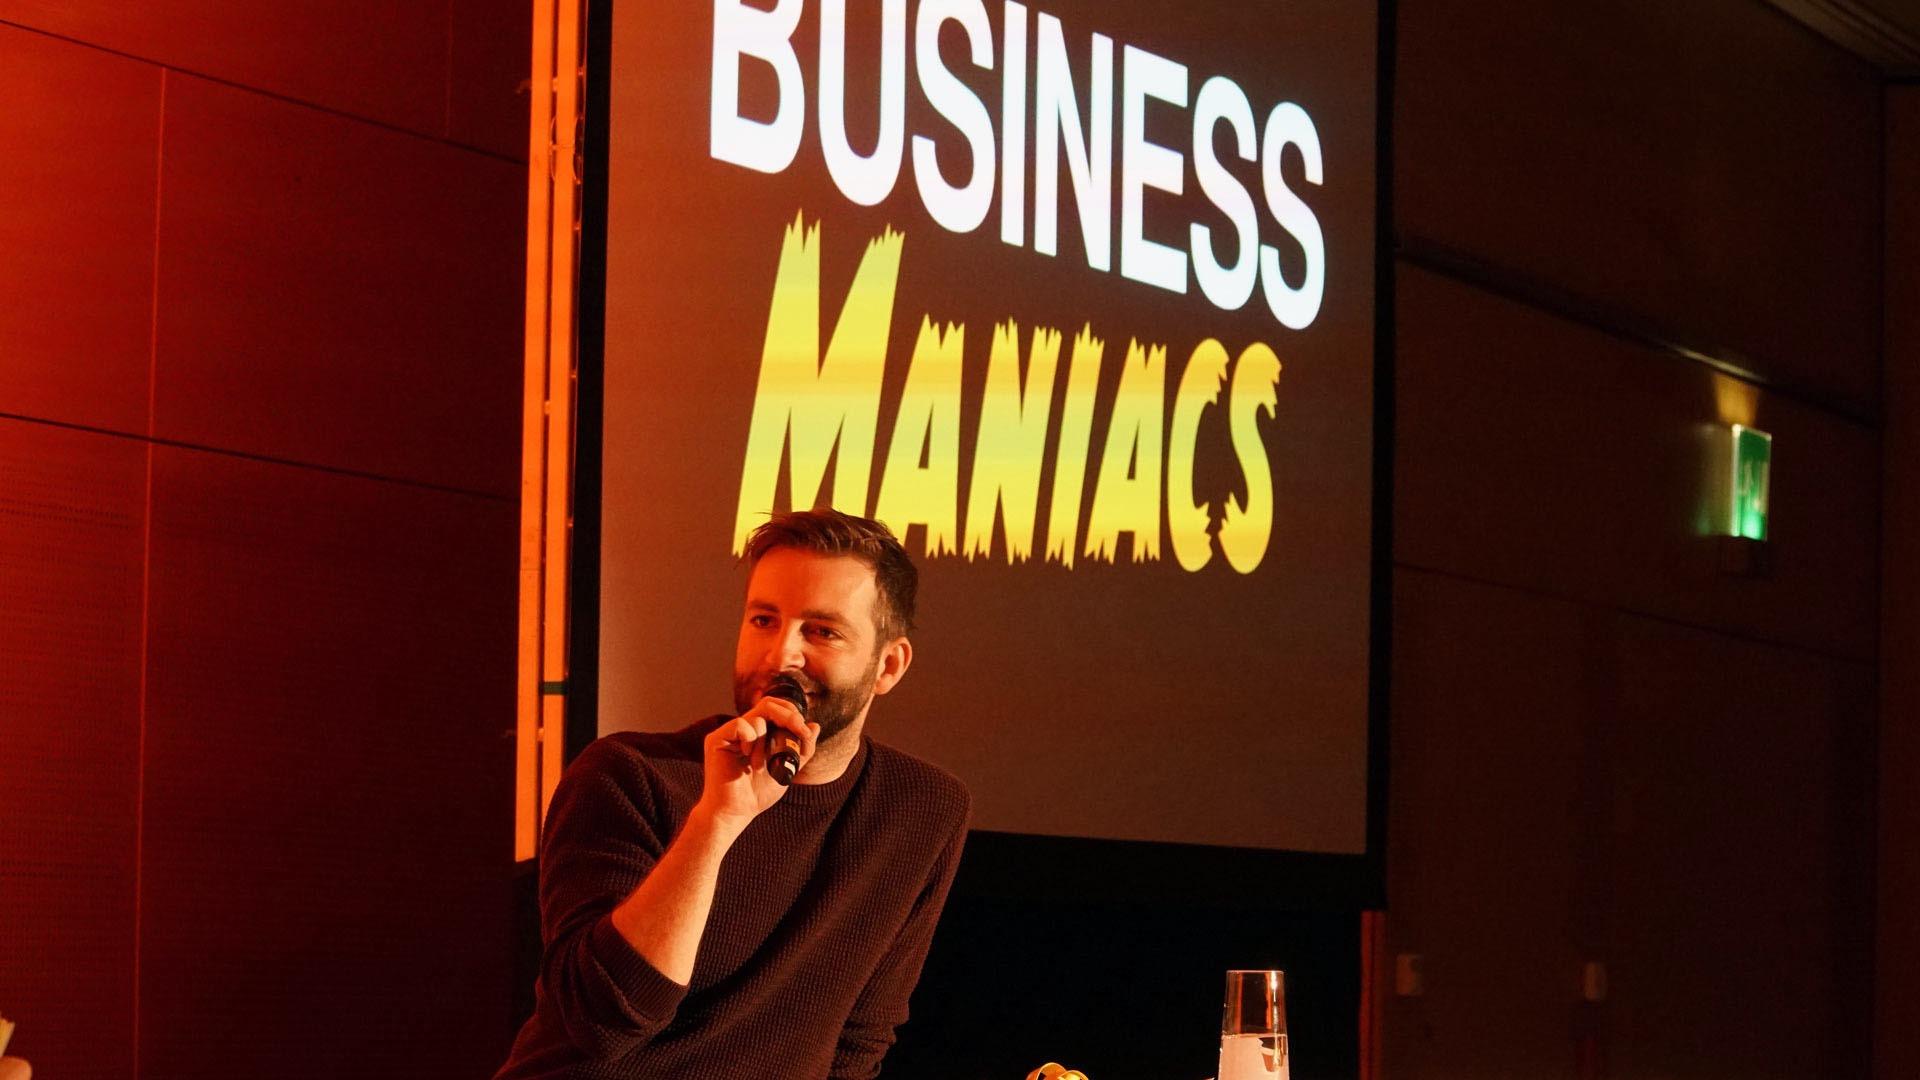 Josh-Business-Maniacs